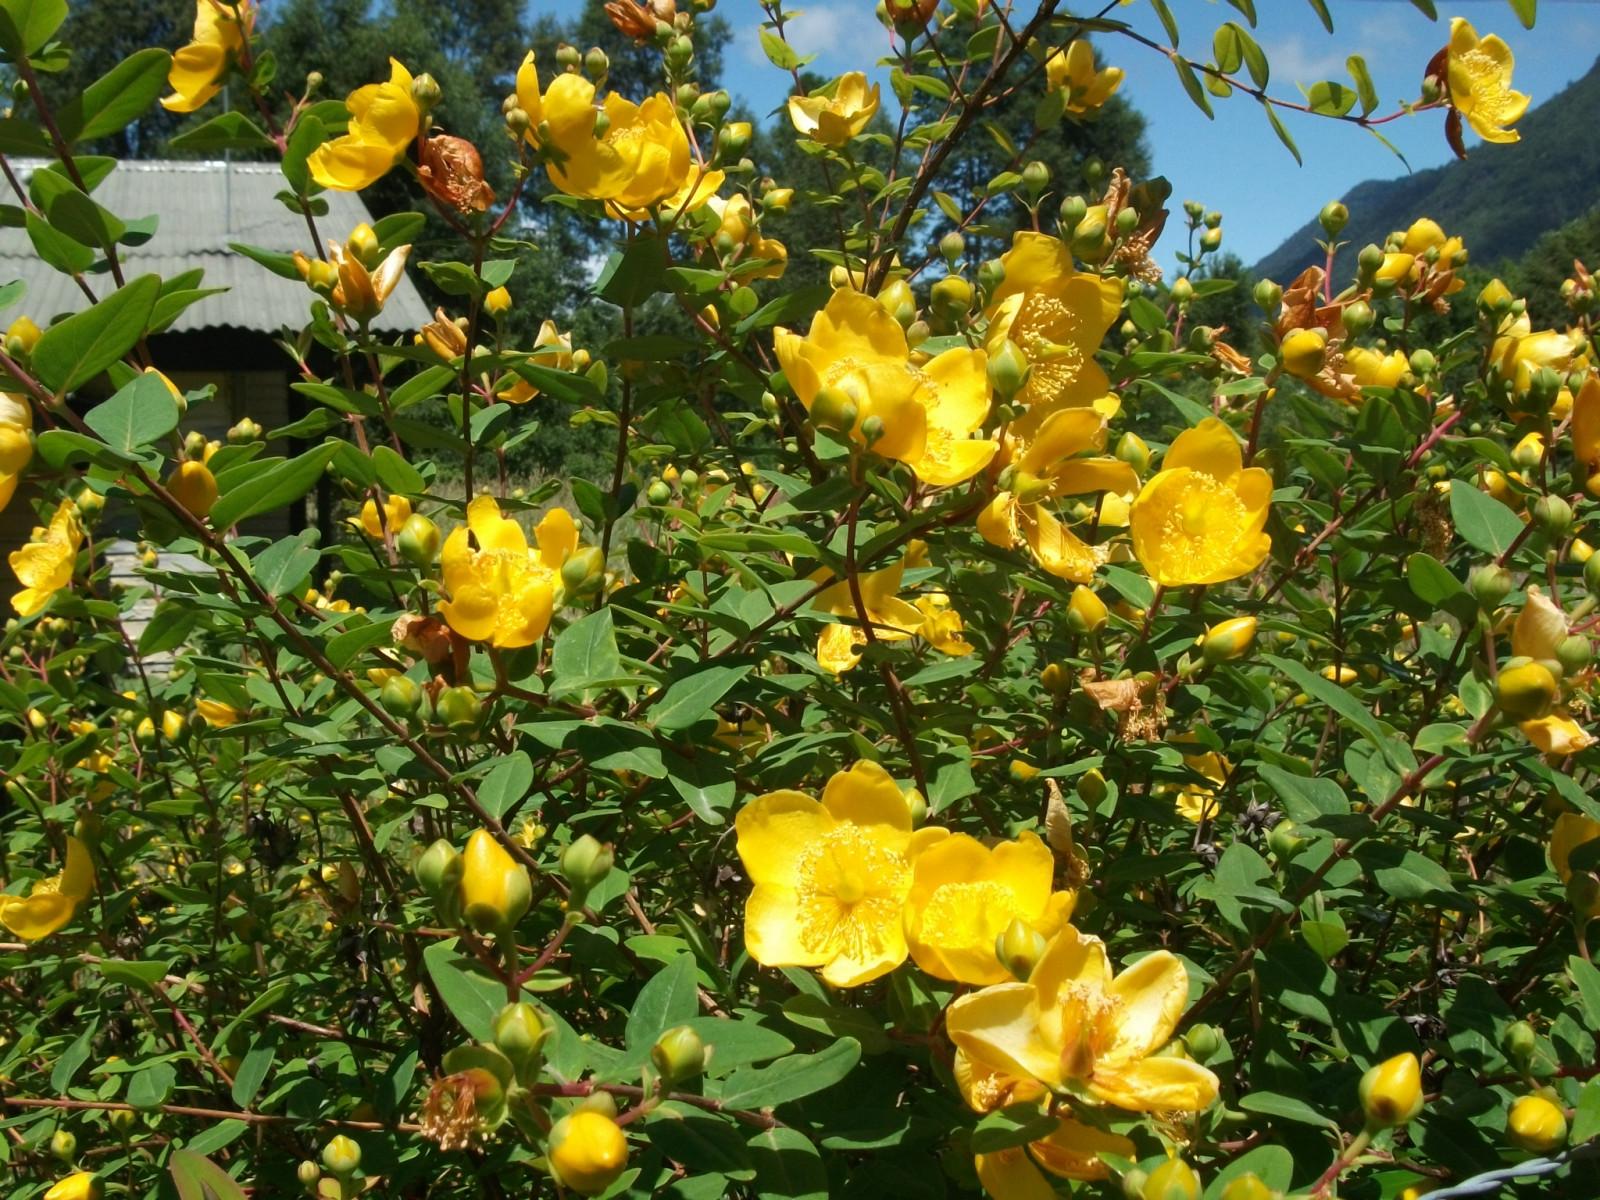 fond d 39 cran la nature fleurs jaunes les plantes jaune feuilles persistantes fleur. Black Bedroom Furniture Sets. Home Design Ideas